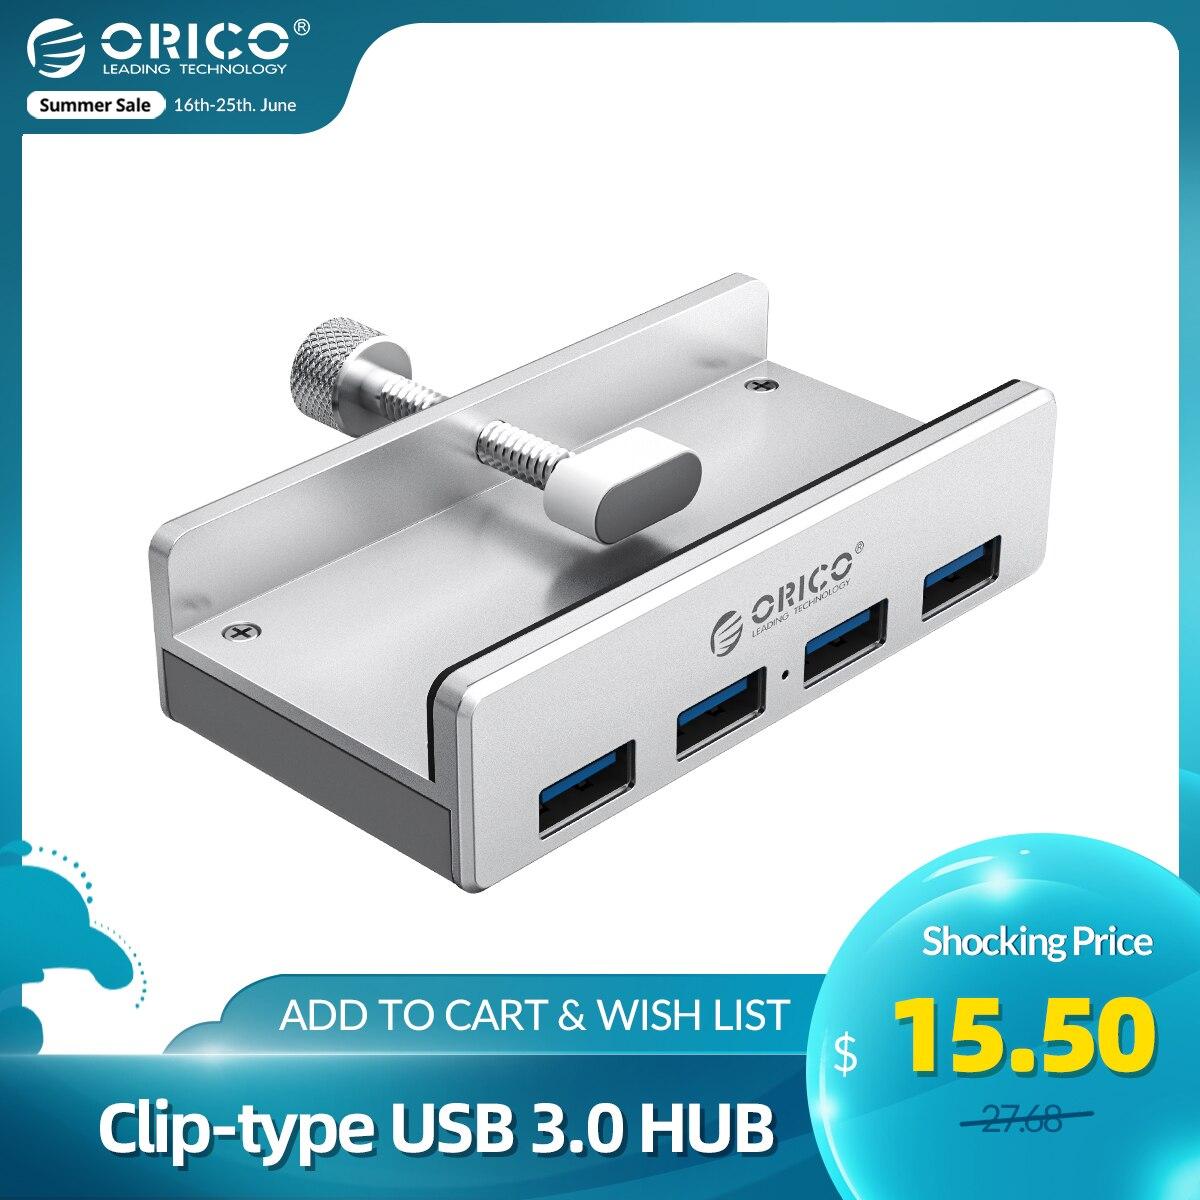 ORICO Clip-type USB 3.0 HUB Aluminum External Multi 4 Ports USB Splitter Adapter for Desktop Laptop Computer Accessories(MH4PU)